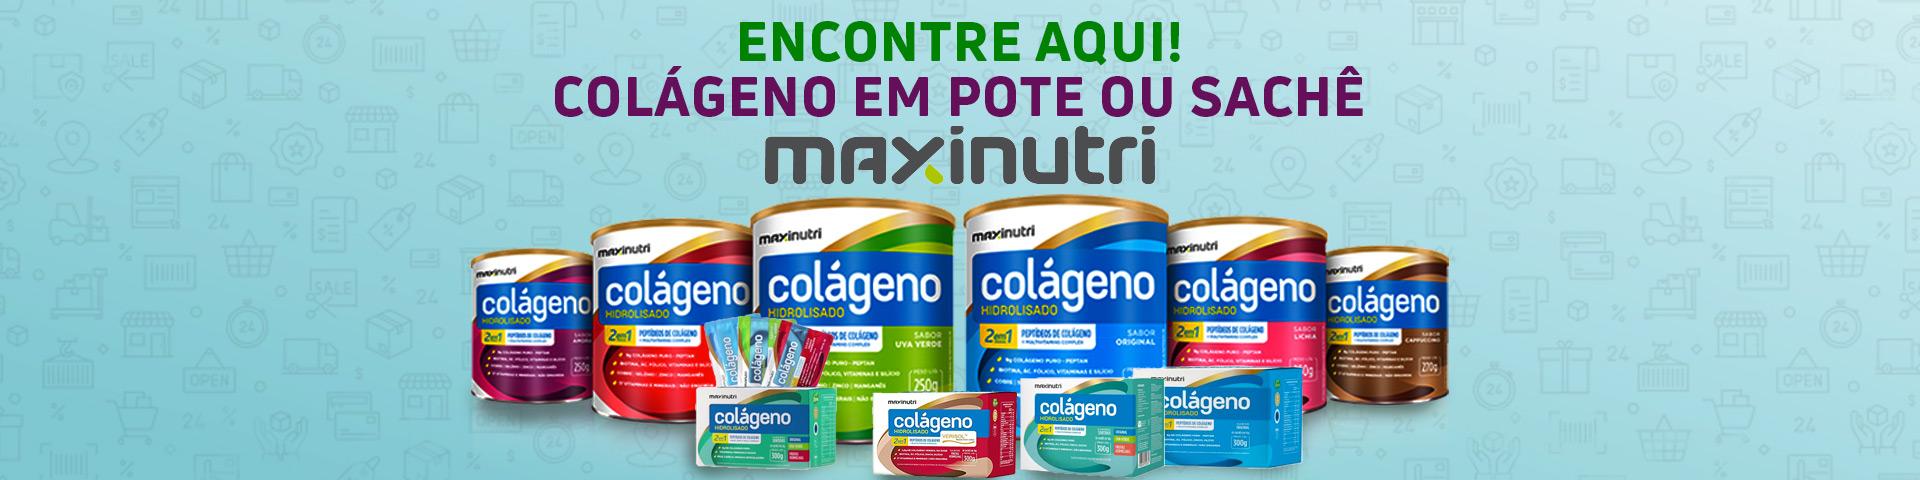 COLAGENOS MAXINUTRI